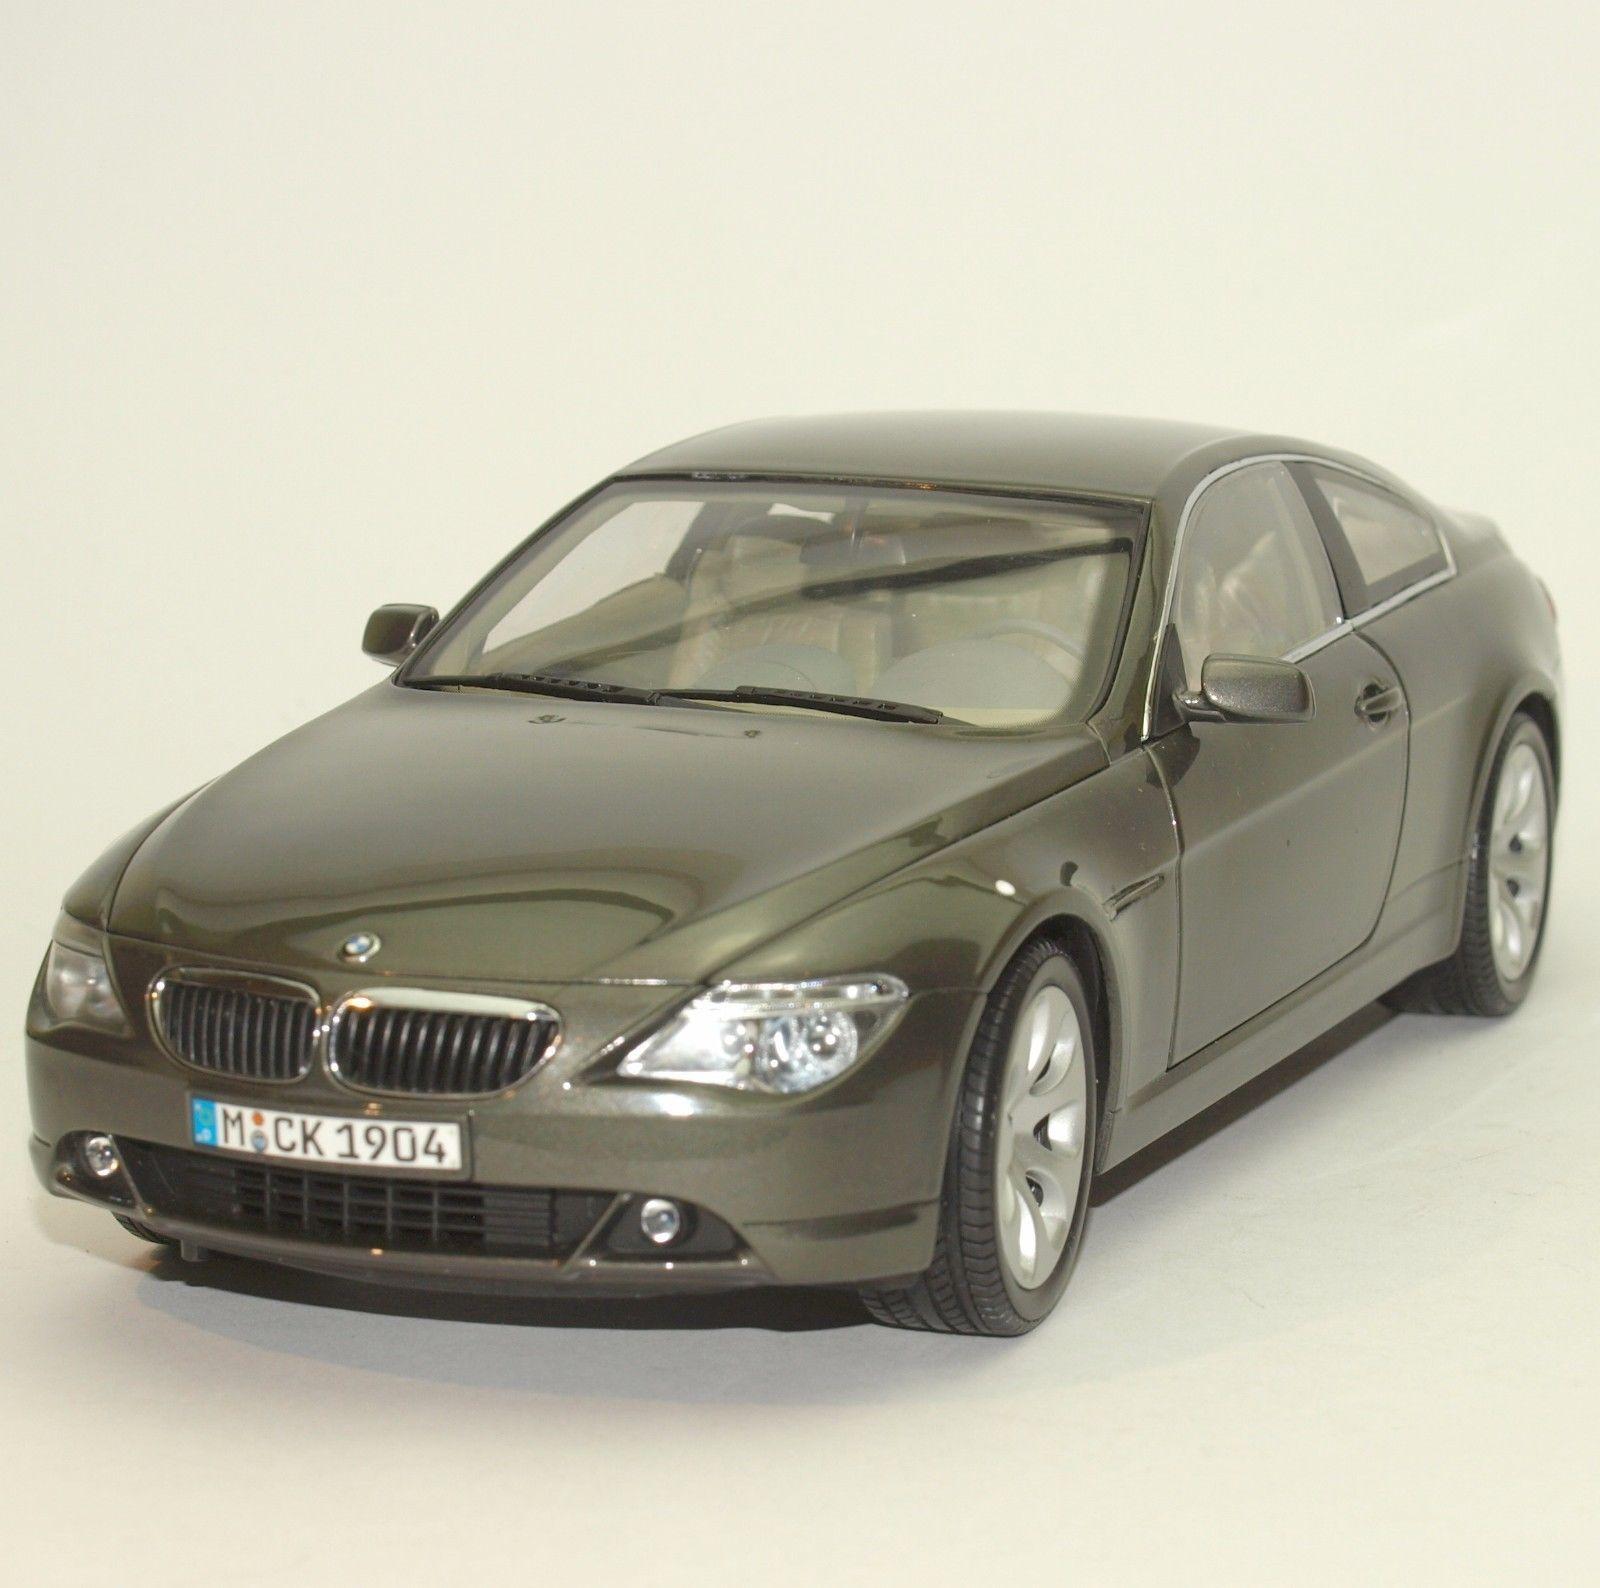 1/18 Kyosho BMW 645Ci 6er Coupé (metallic green/grey) Dealer Edition